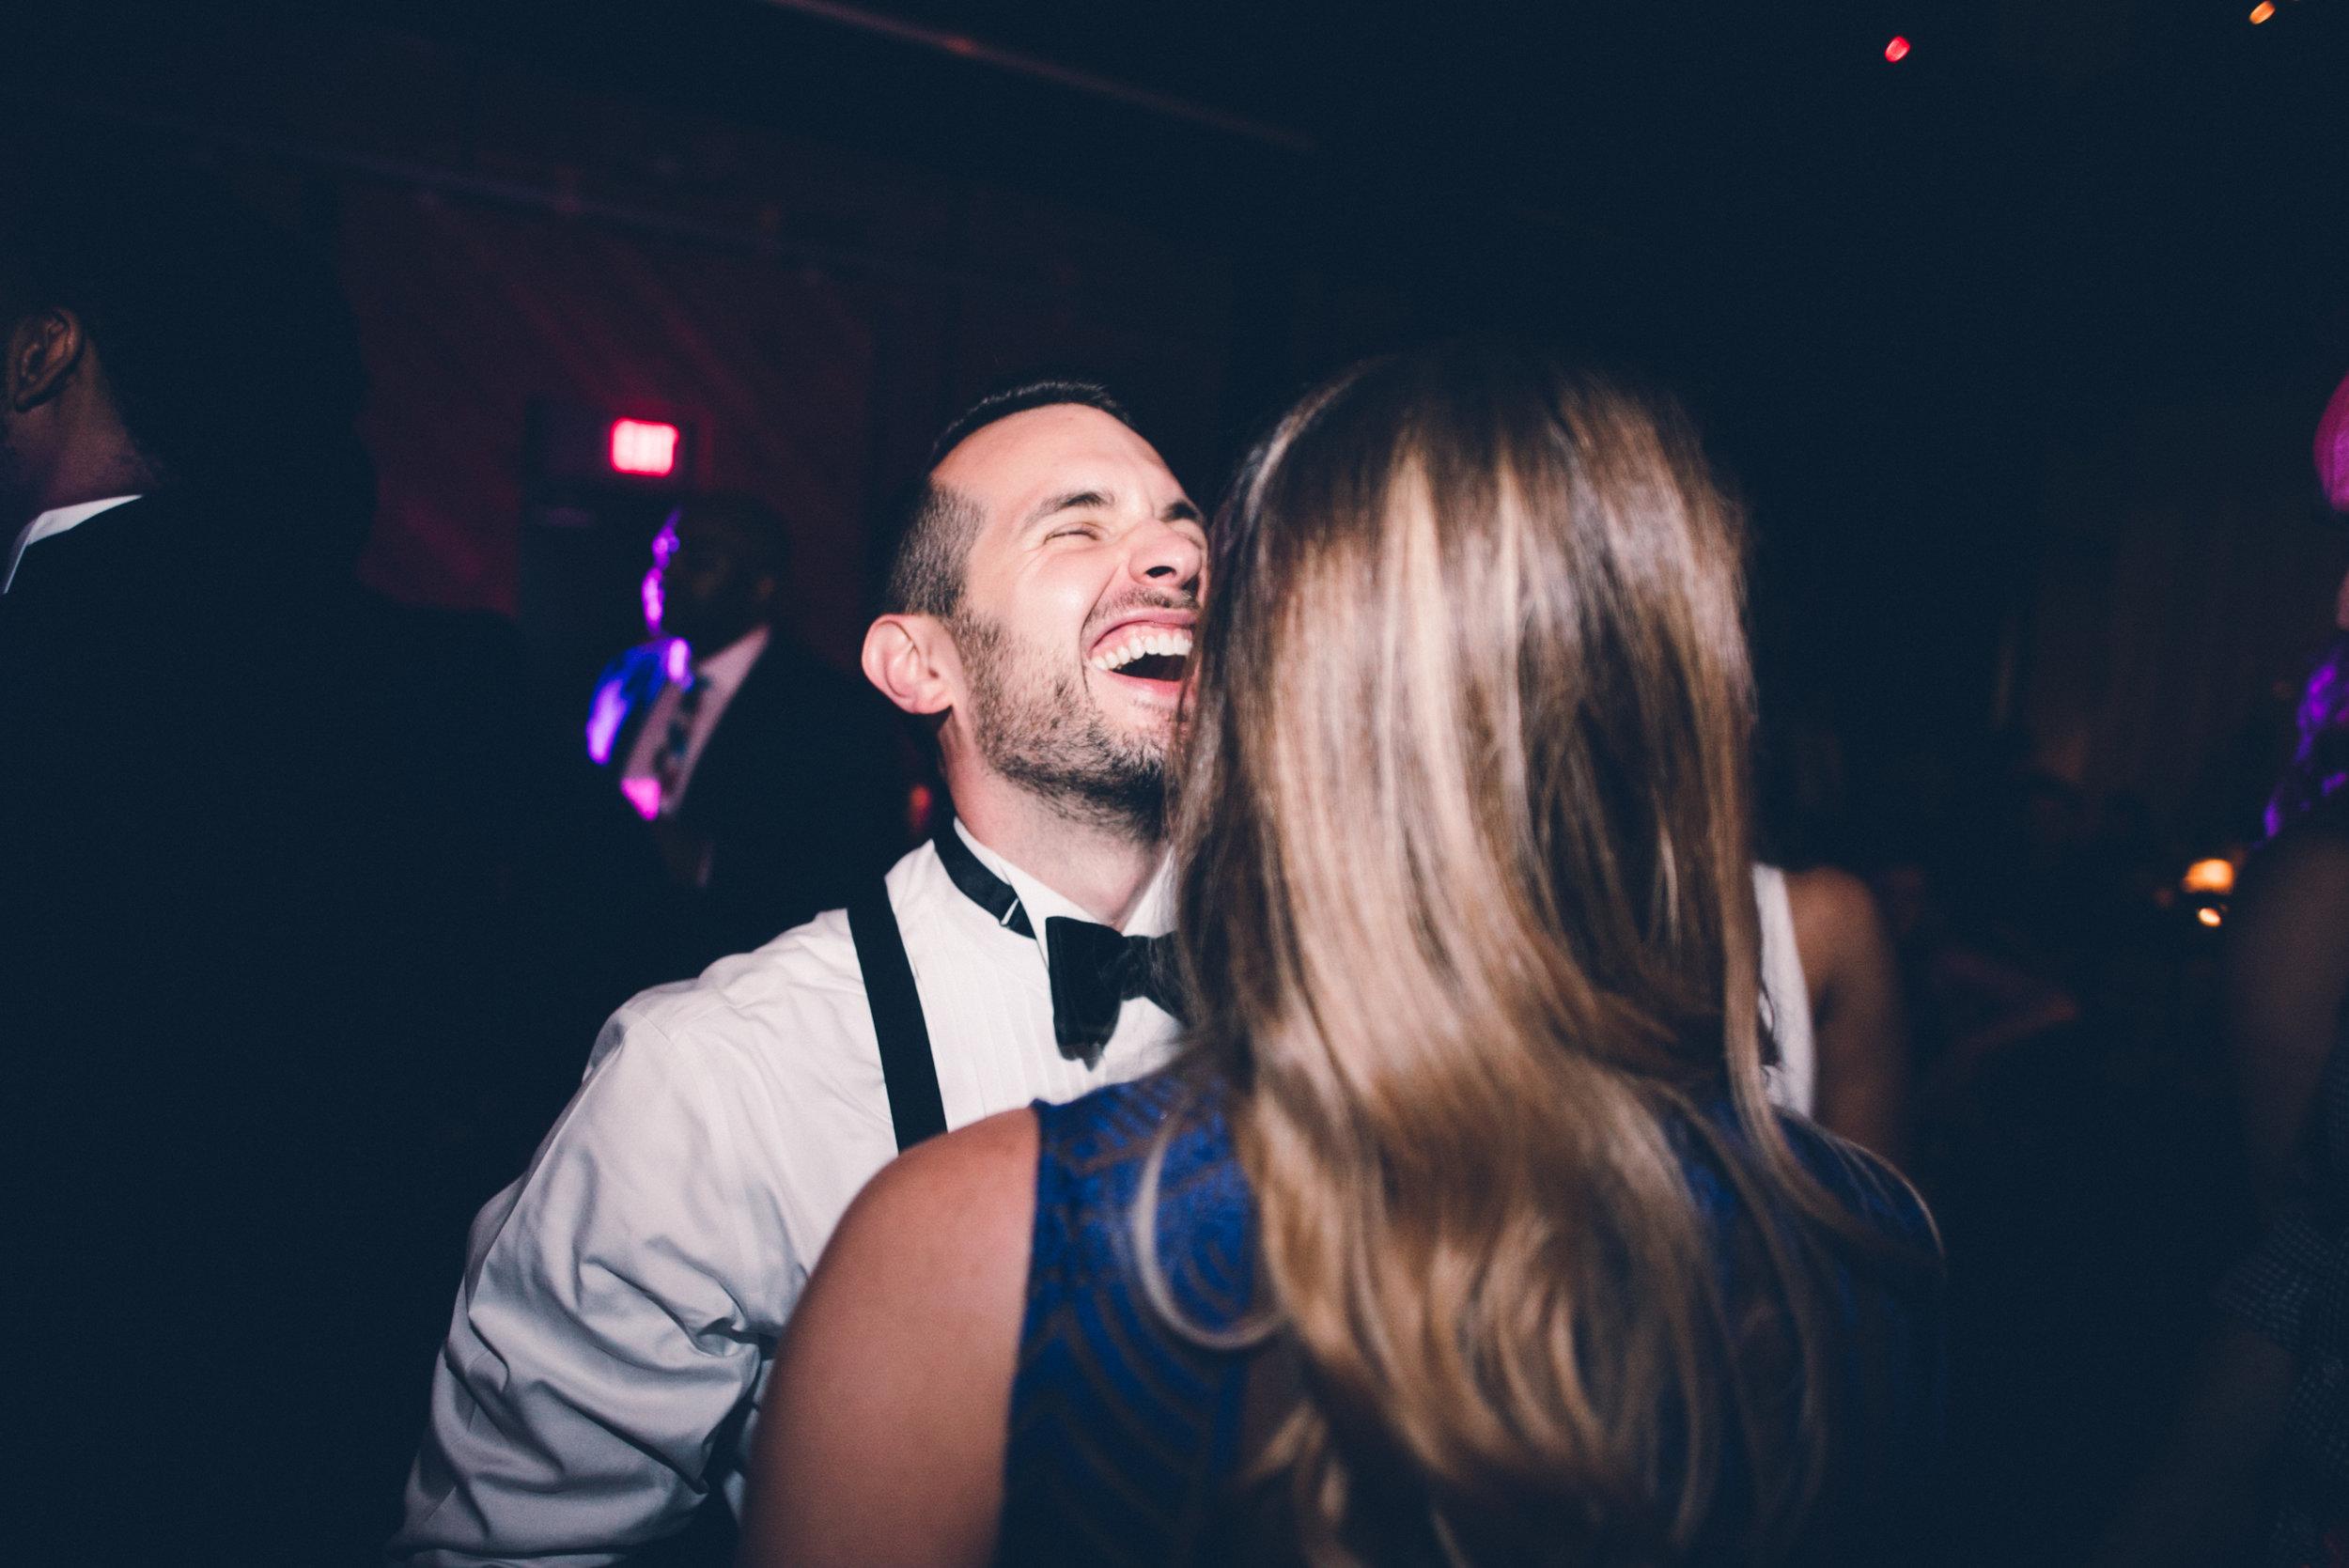 Pittsburgh Pennsylvania New York NYC Wedding Photographer Photojournalist Luxury Downtown Opera - Stirpe 1700.jpg